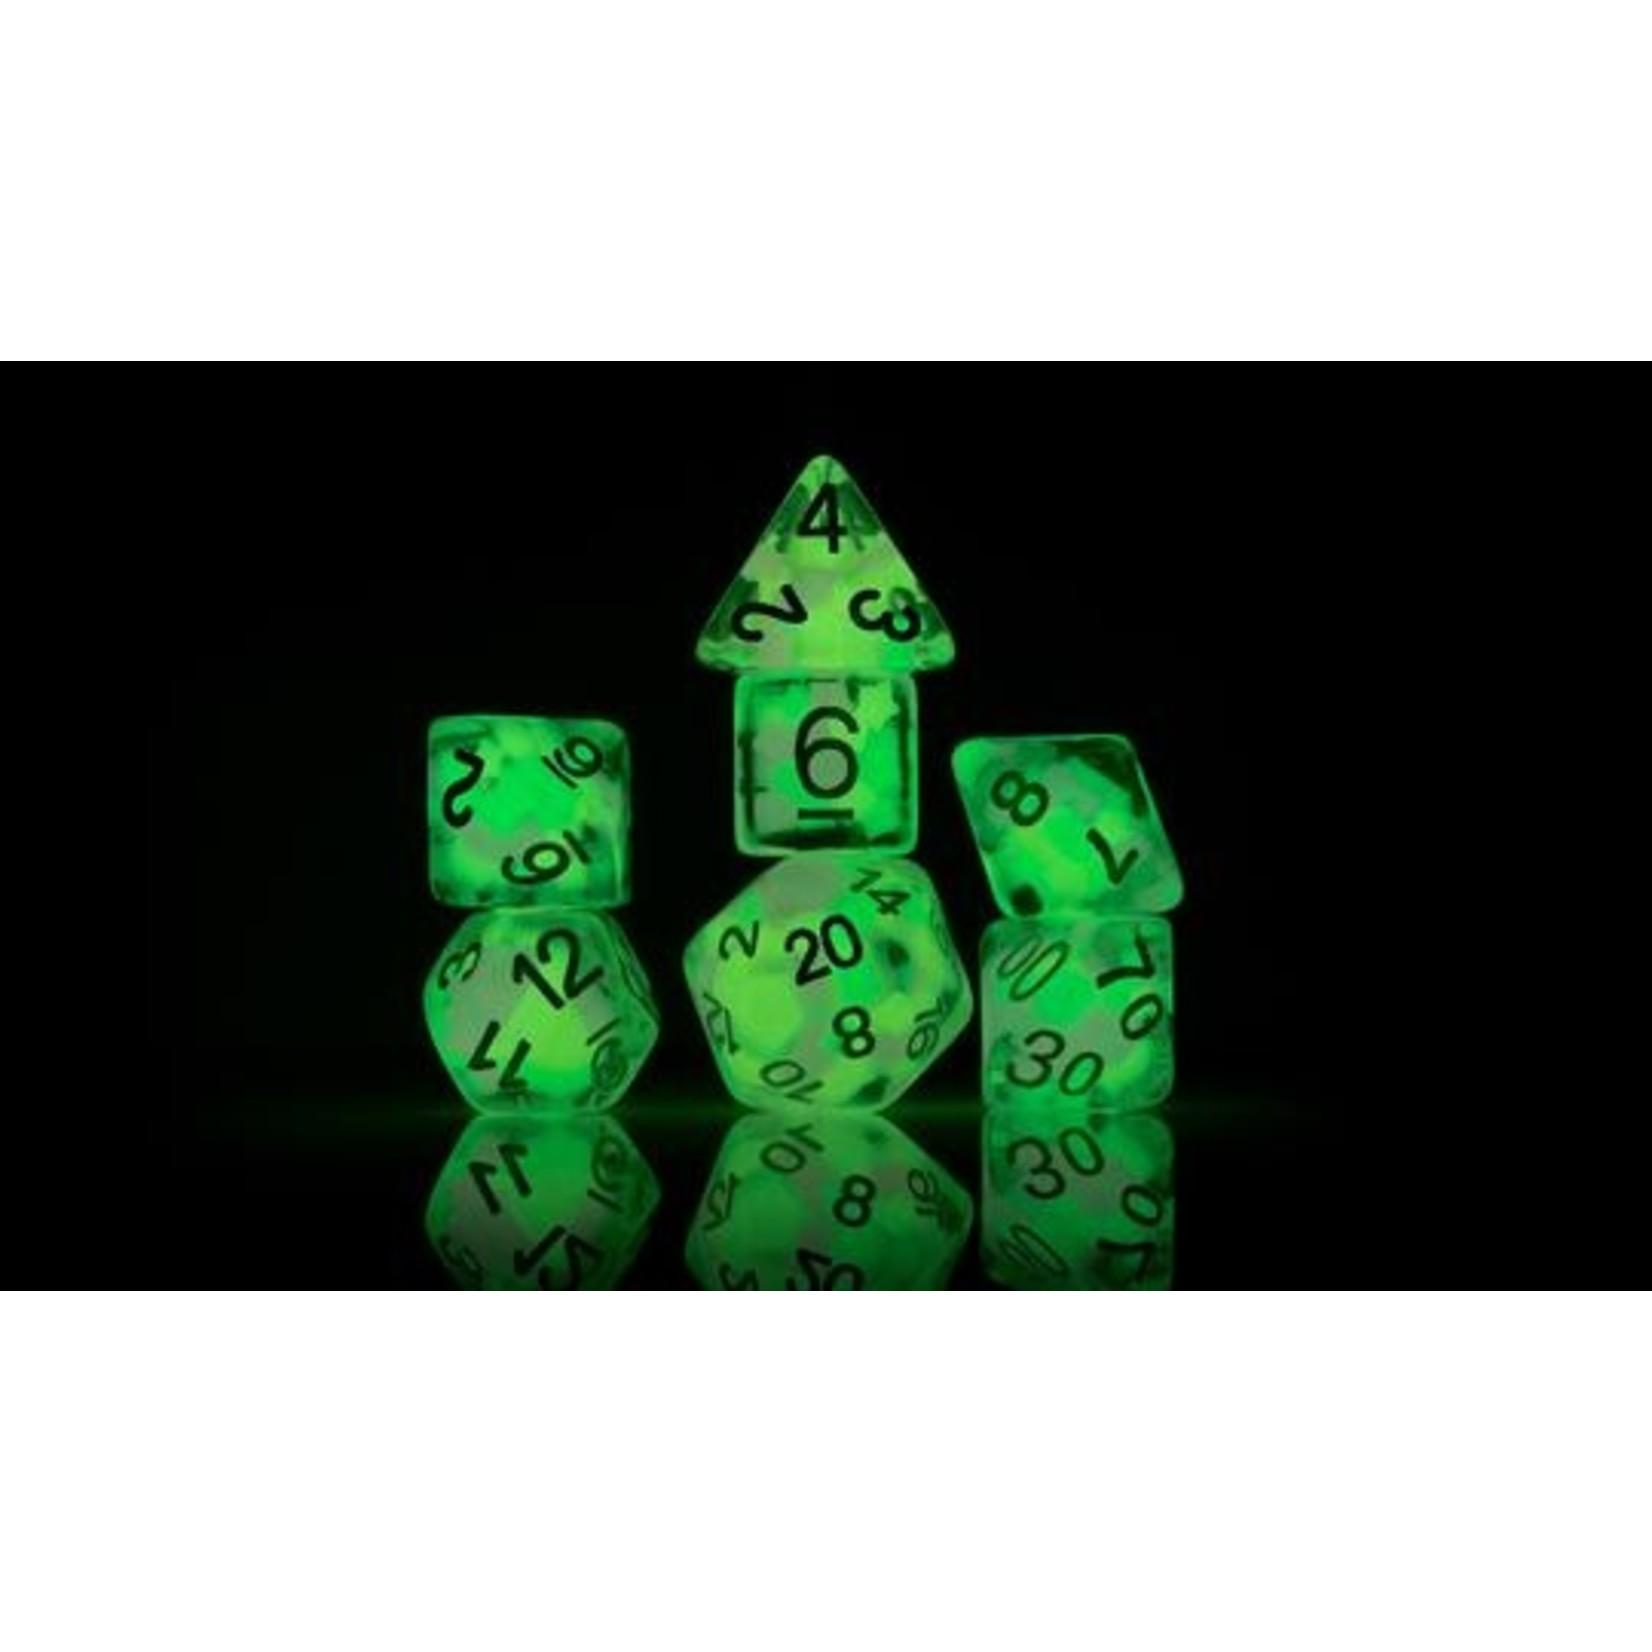 Melon Ball Glowworm RPG Dice Set (7)